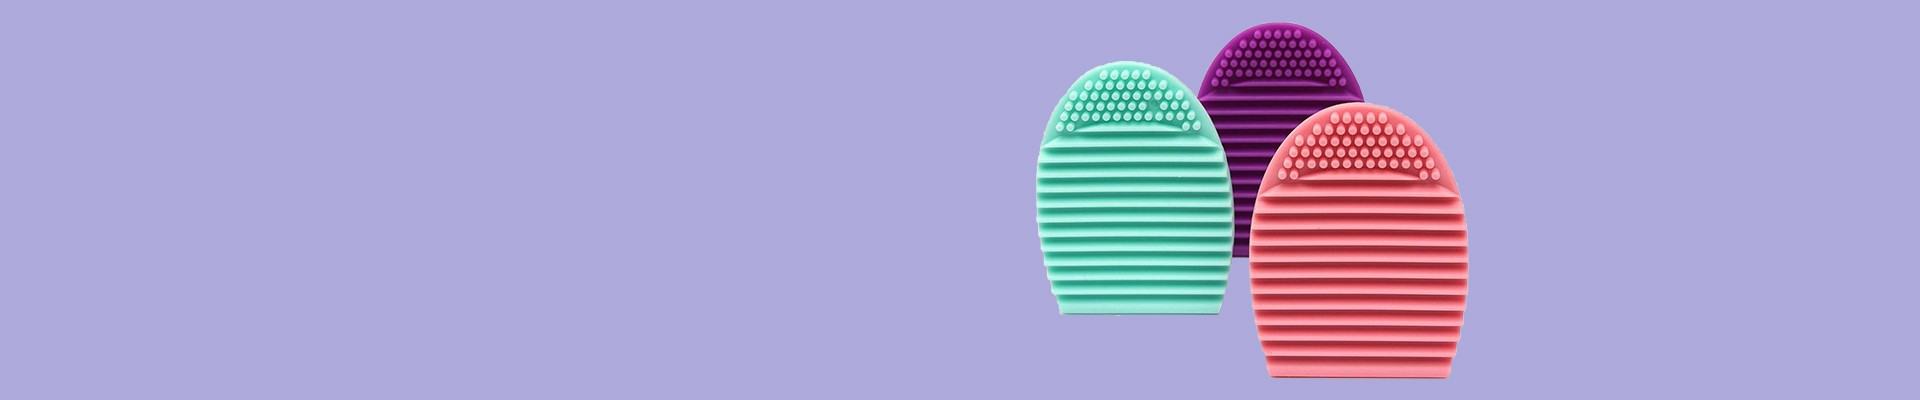 Jual Pembersih Brush Makeup - Pembersih Brush Kosmetik